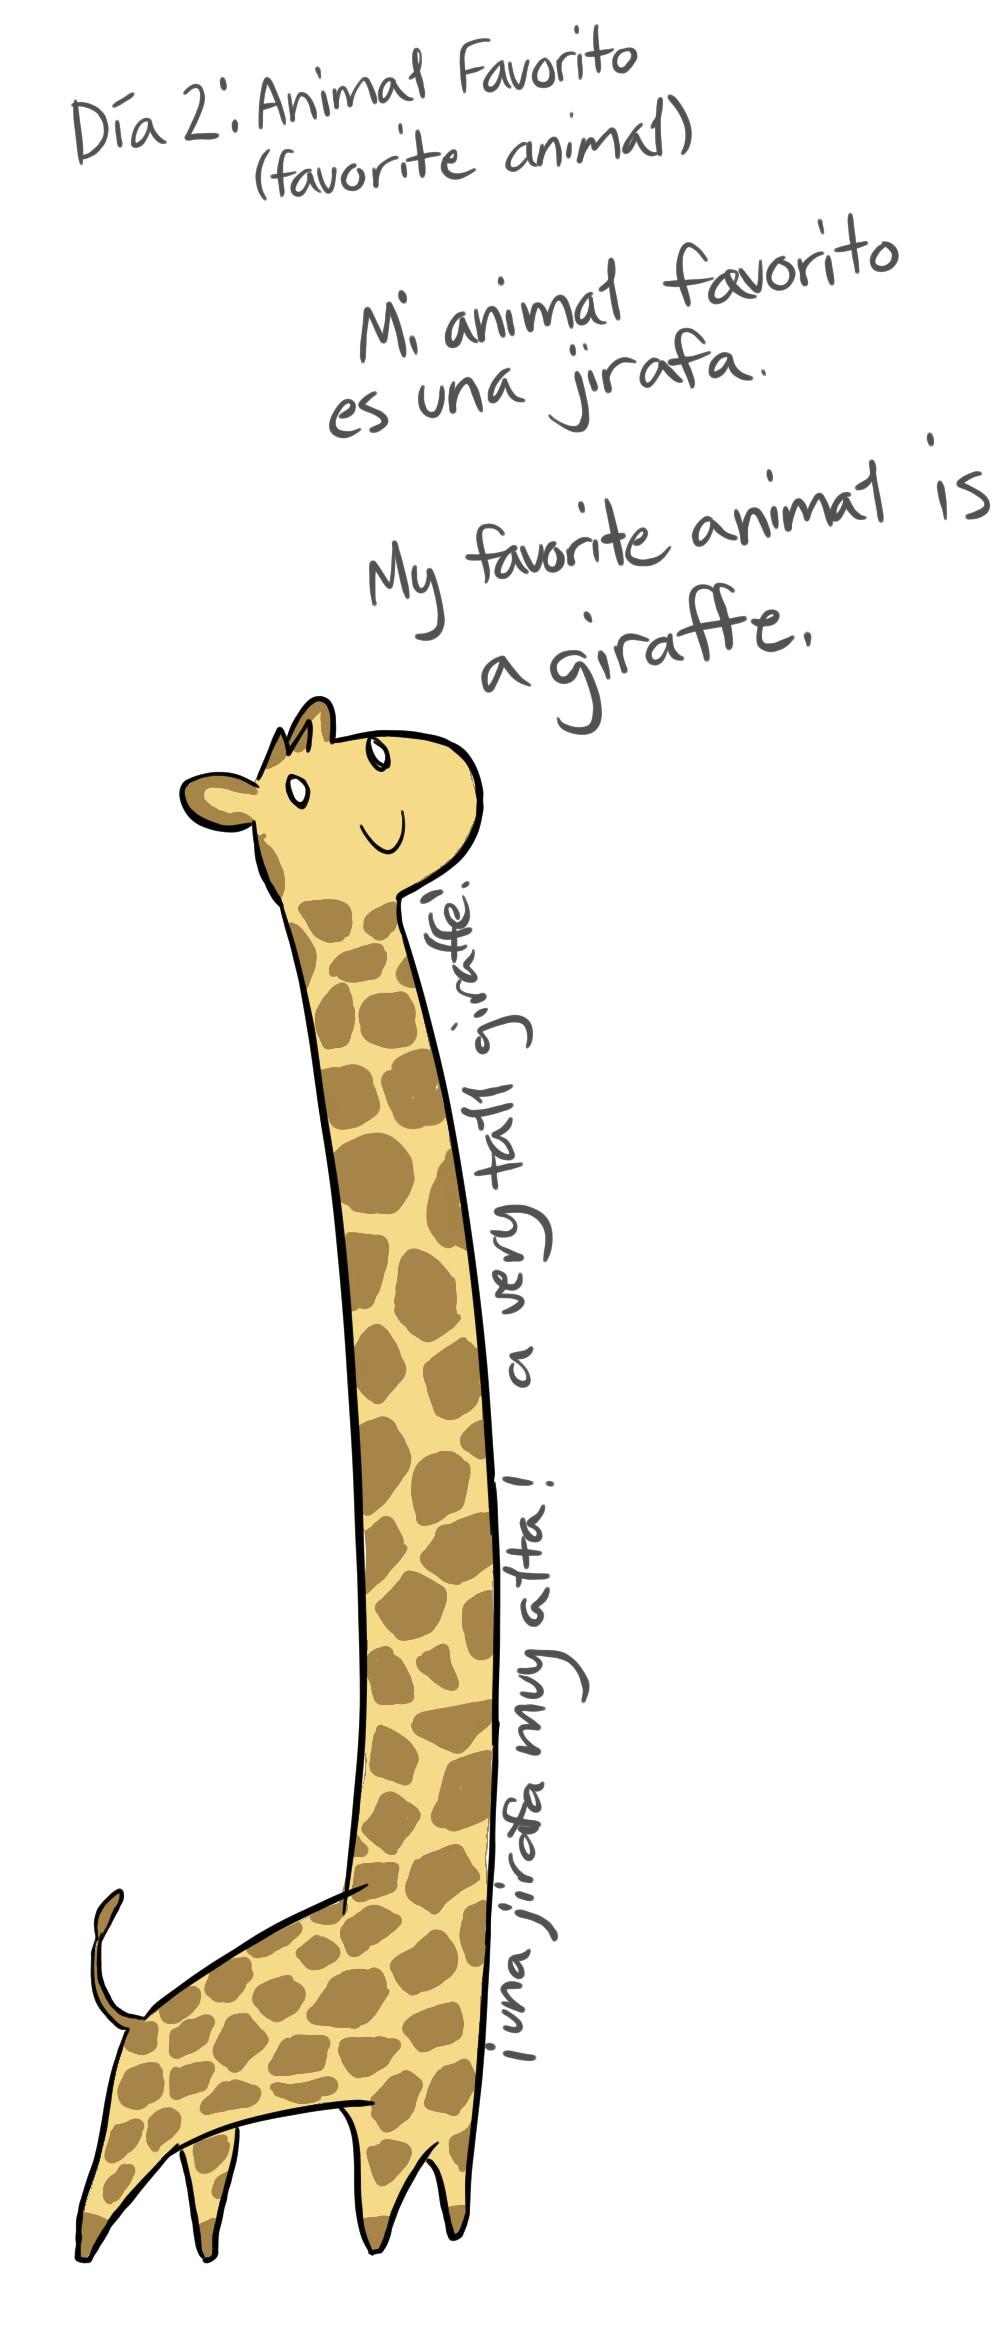 Dia 2: Animal Favorito by MeowMix72